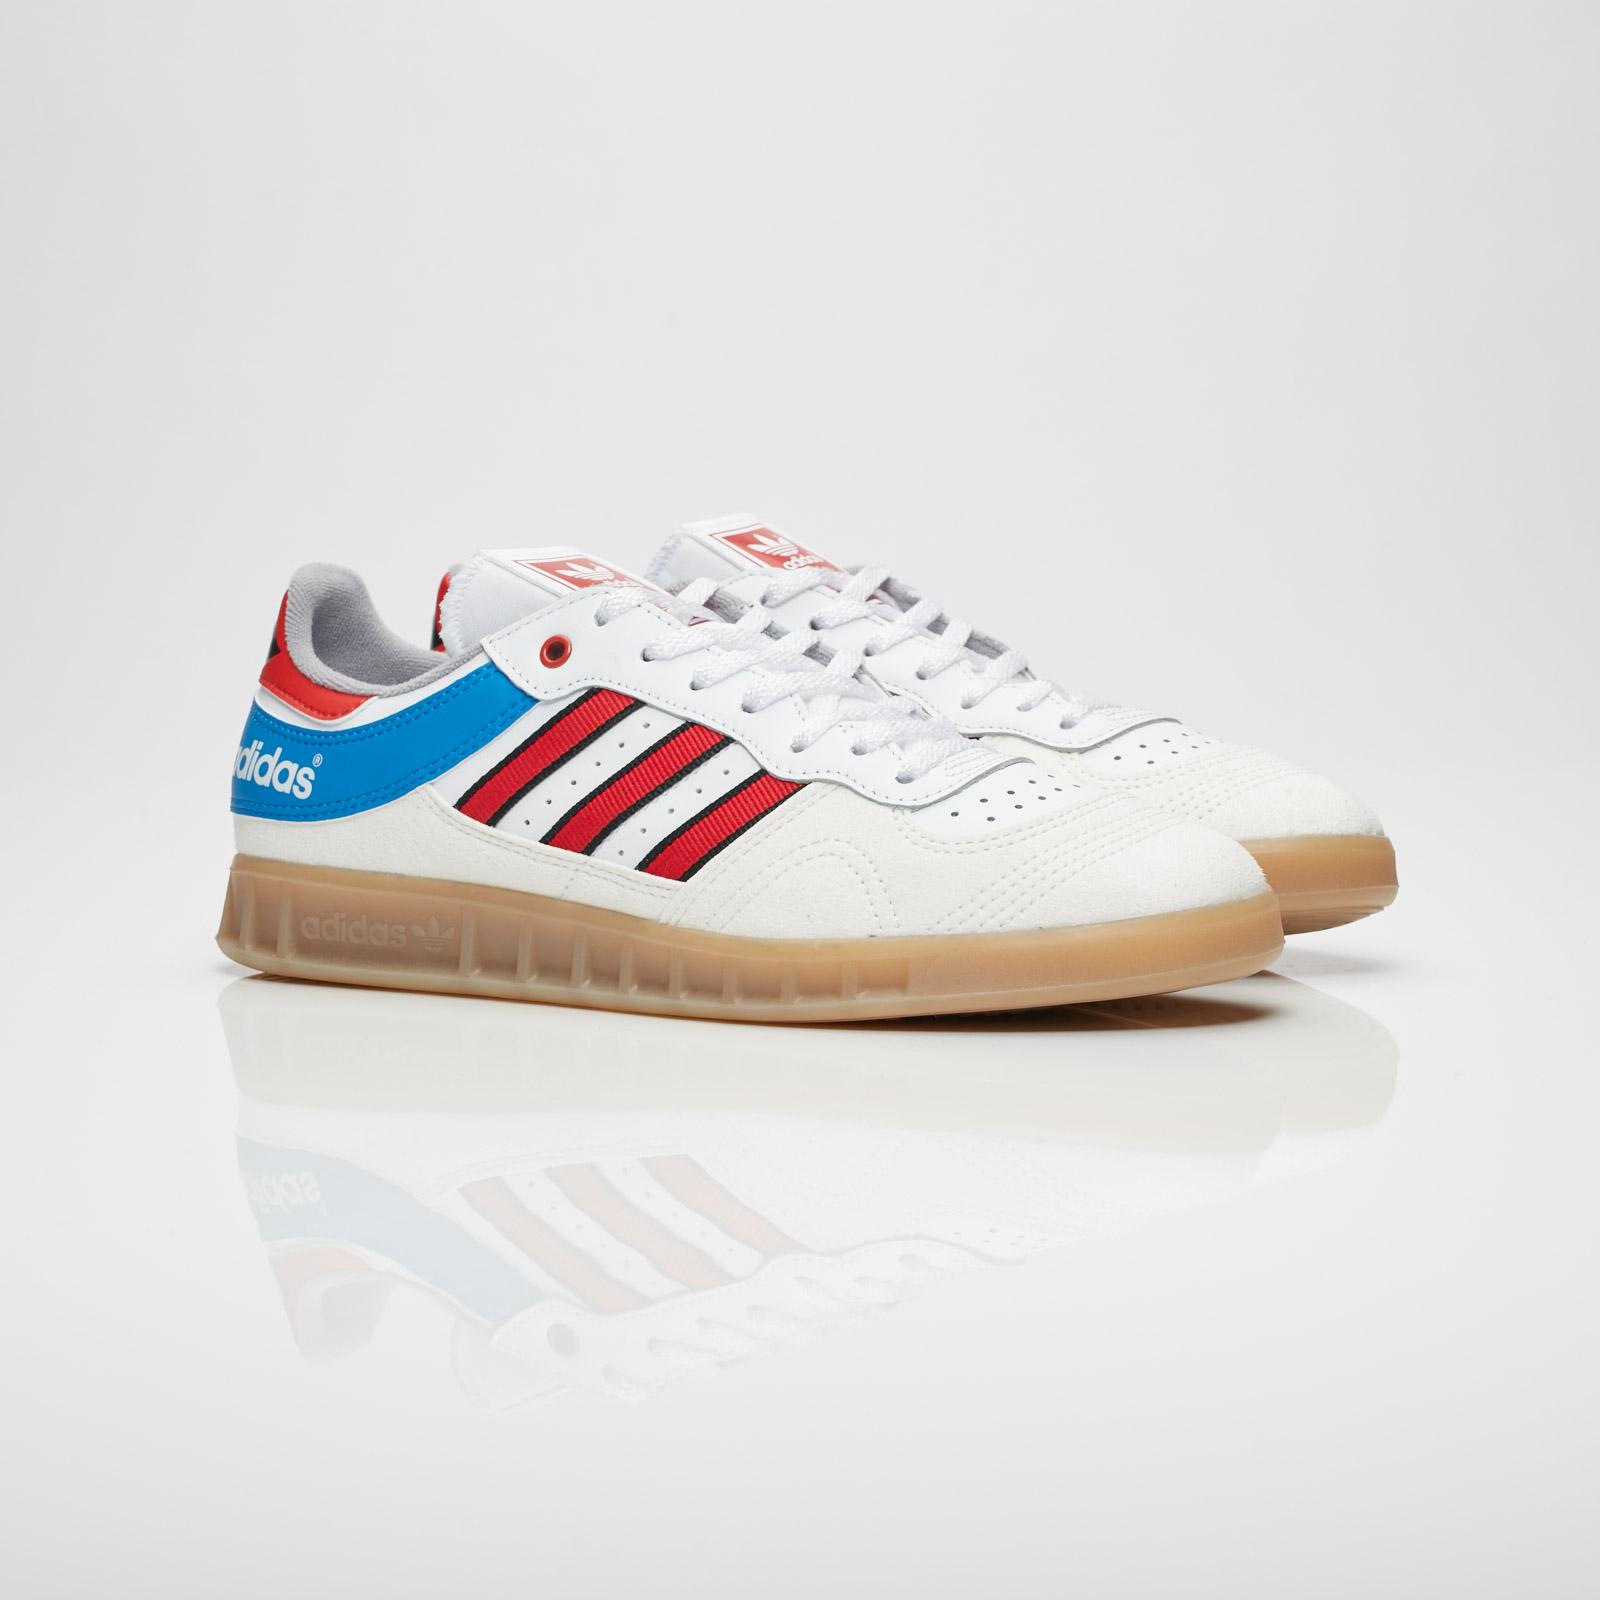 891c63427 adidas Handball Top - By9535 - Sneakersnstuff